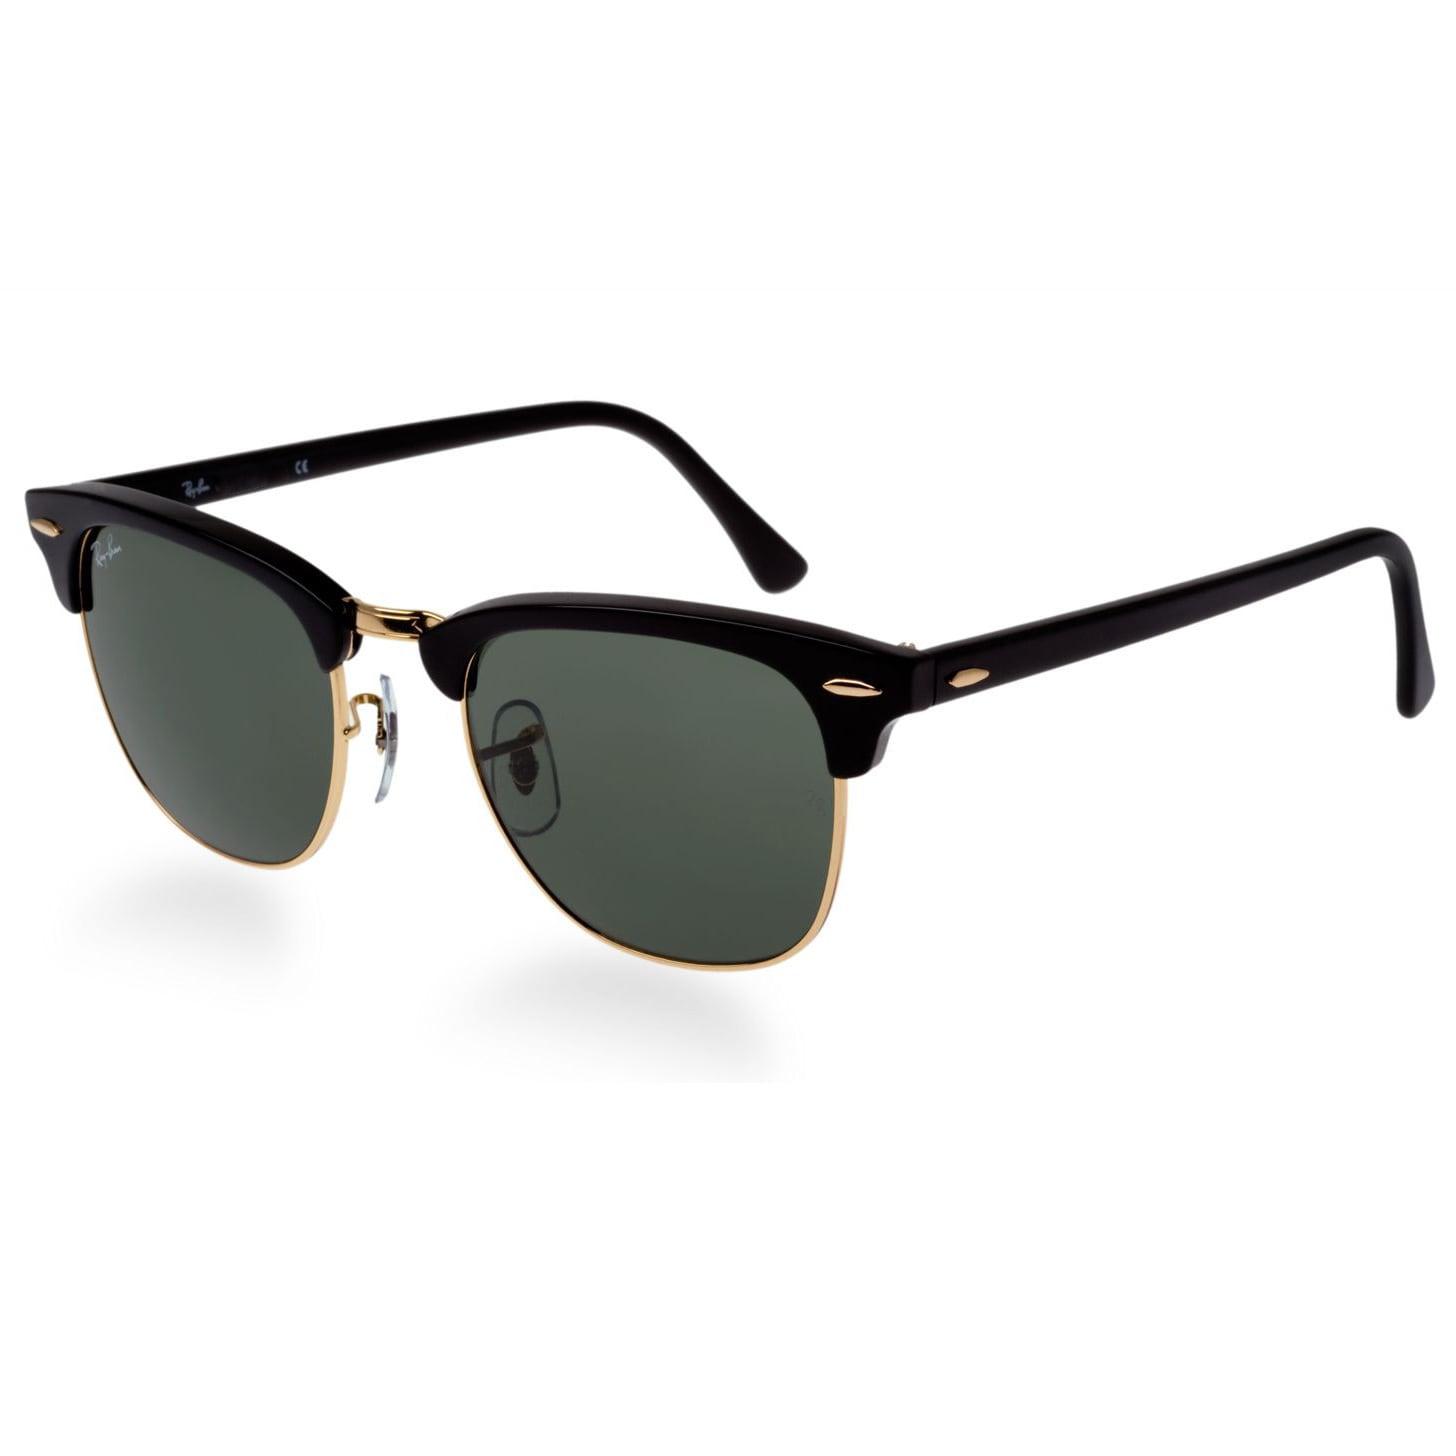 630a92d0fde0 Designer Sunglasses